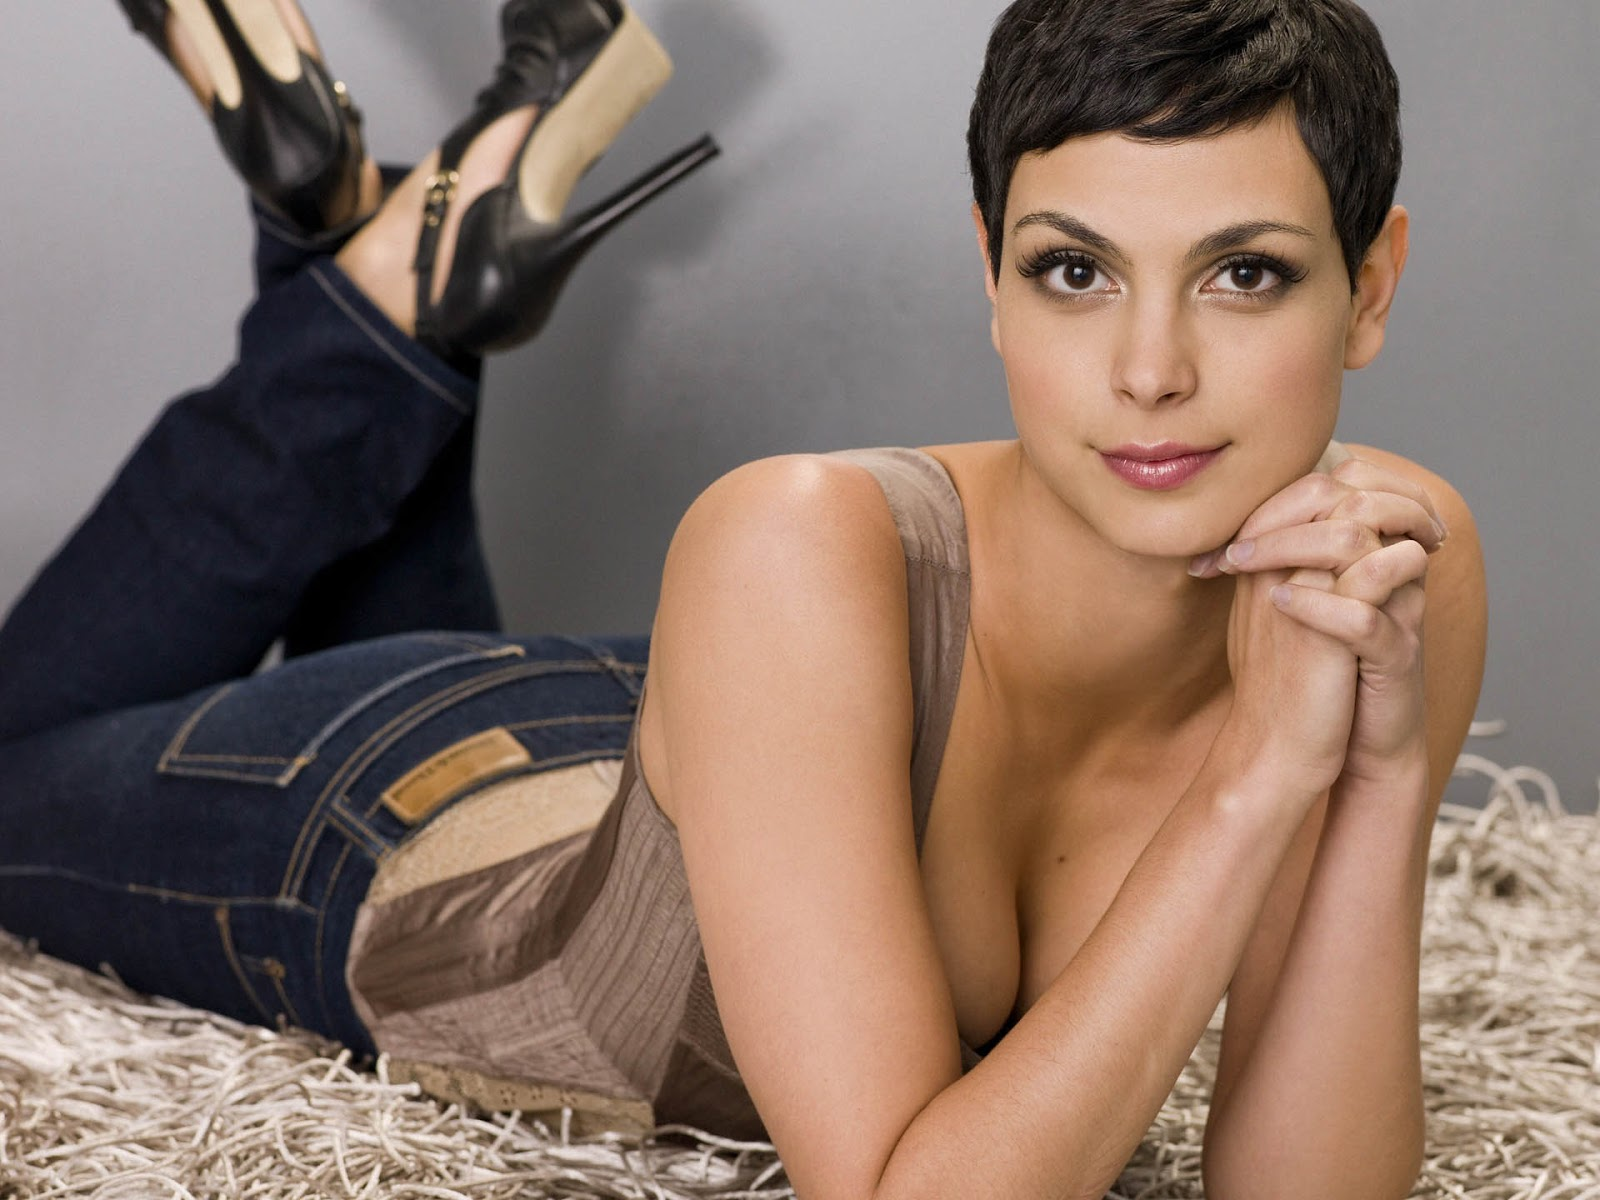 image Brazillian bombshell and bbc soccer player